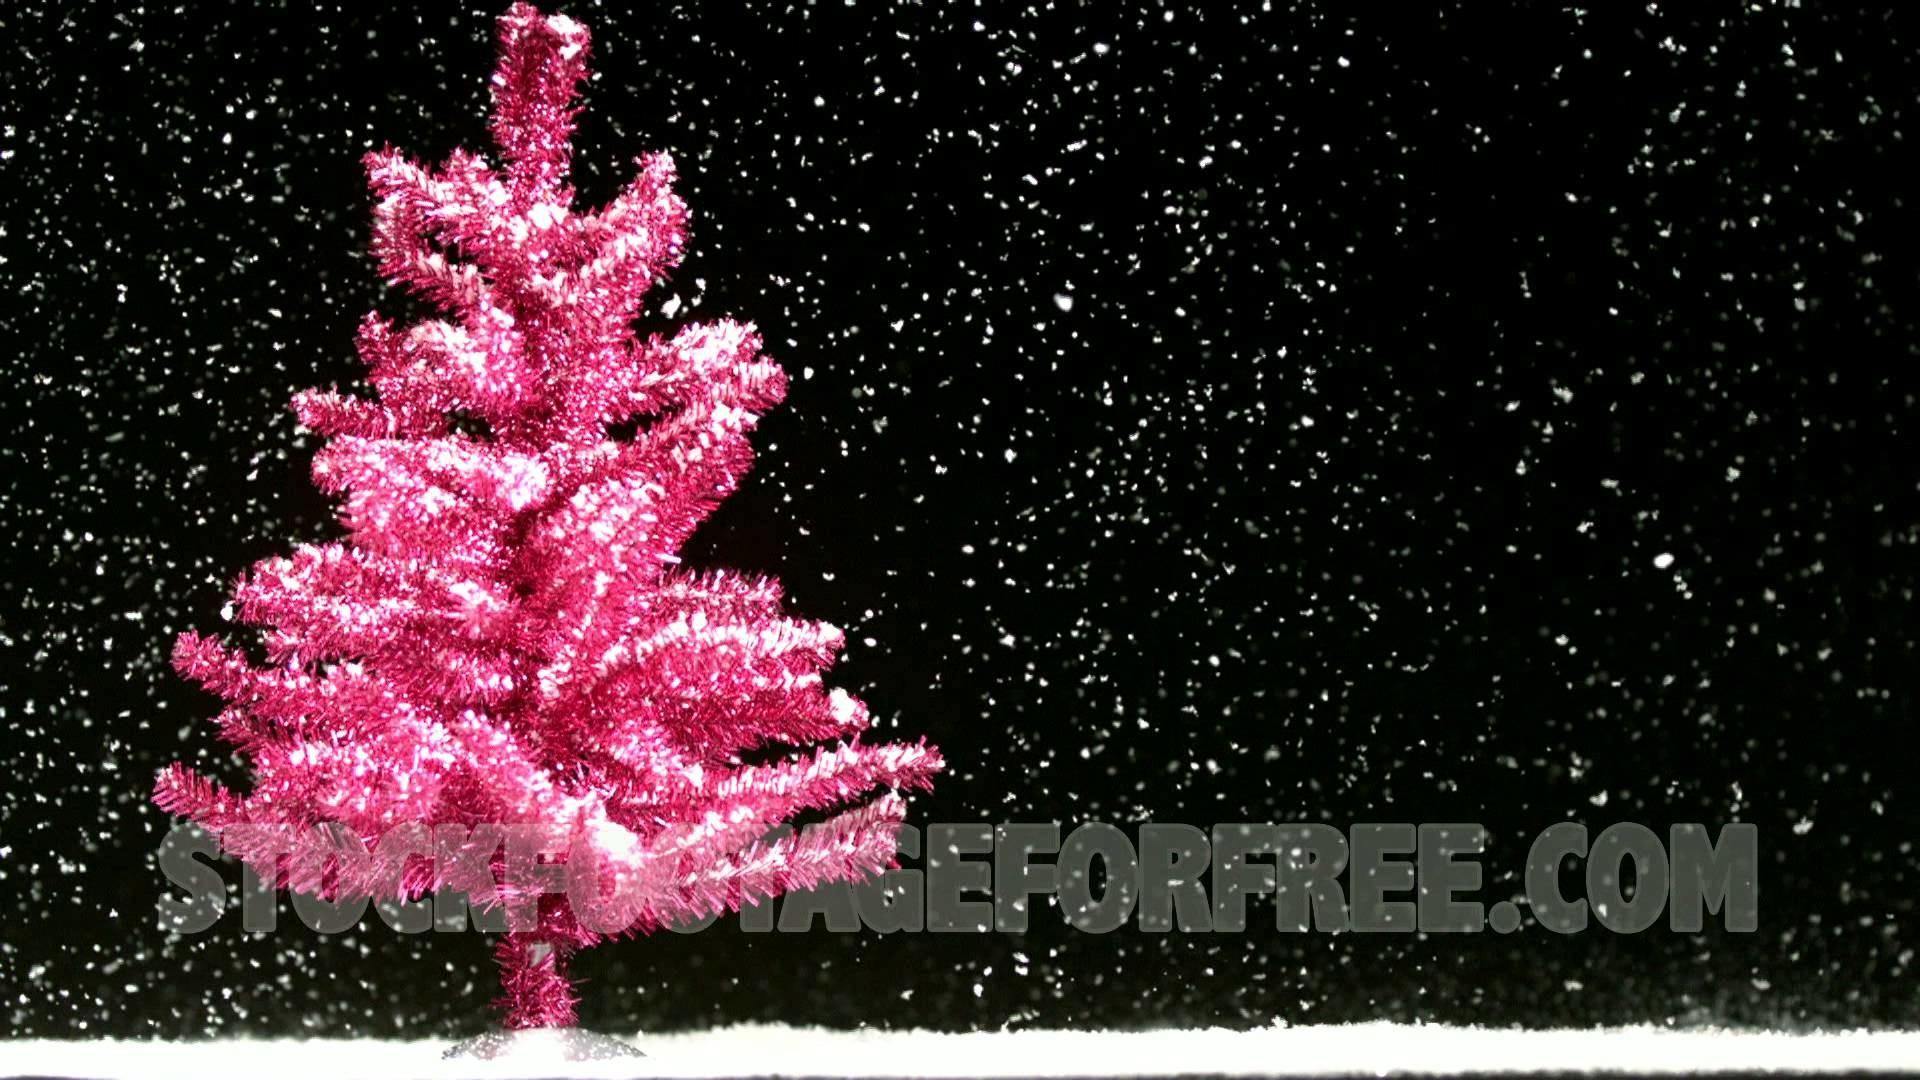 Free Pink Christmas Tree in Snowfall Winter Seasonal Stock Video – YouTube